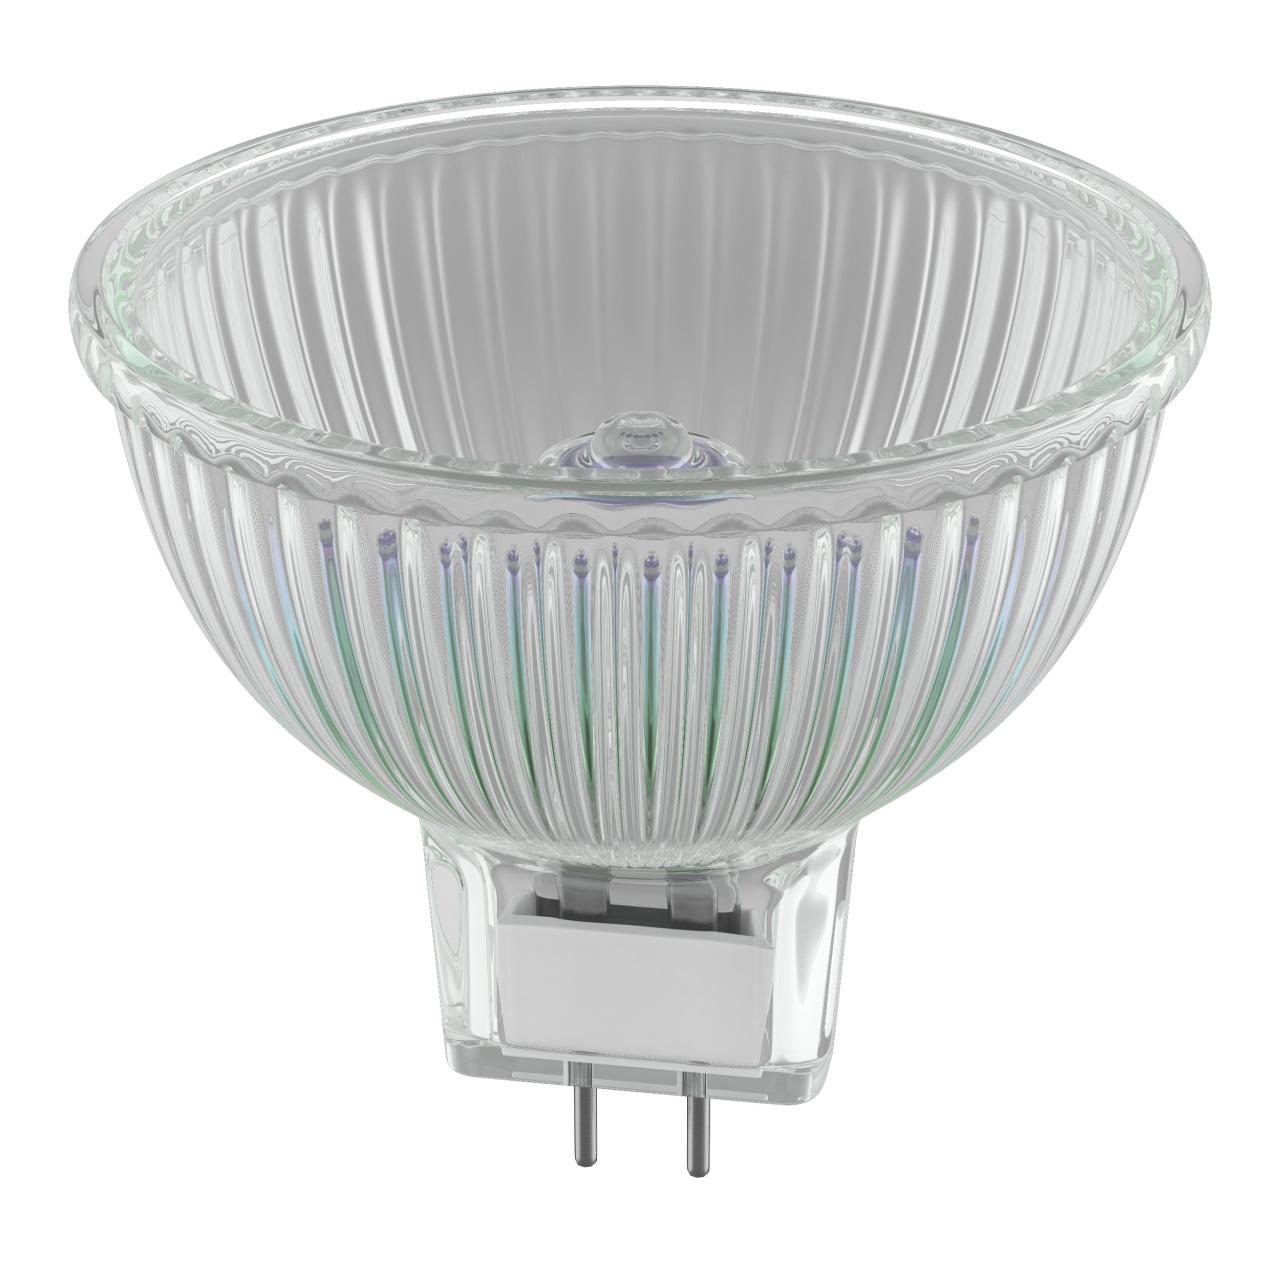 Лампа HAL 12V MR16 G5.3 35W 60G FR RA100 2800K 2000H DIMM Lightstar 921215